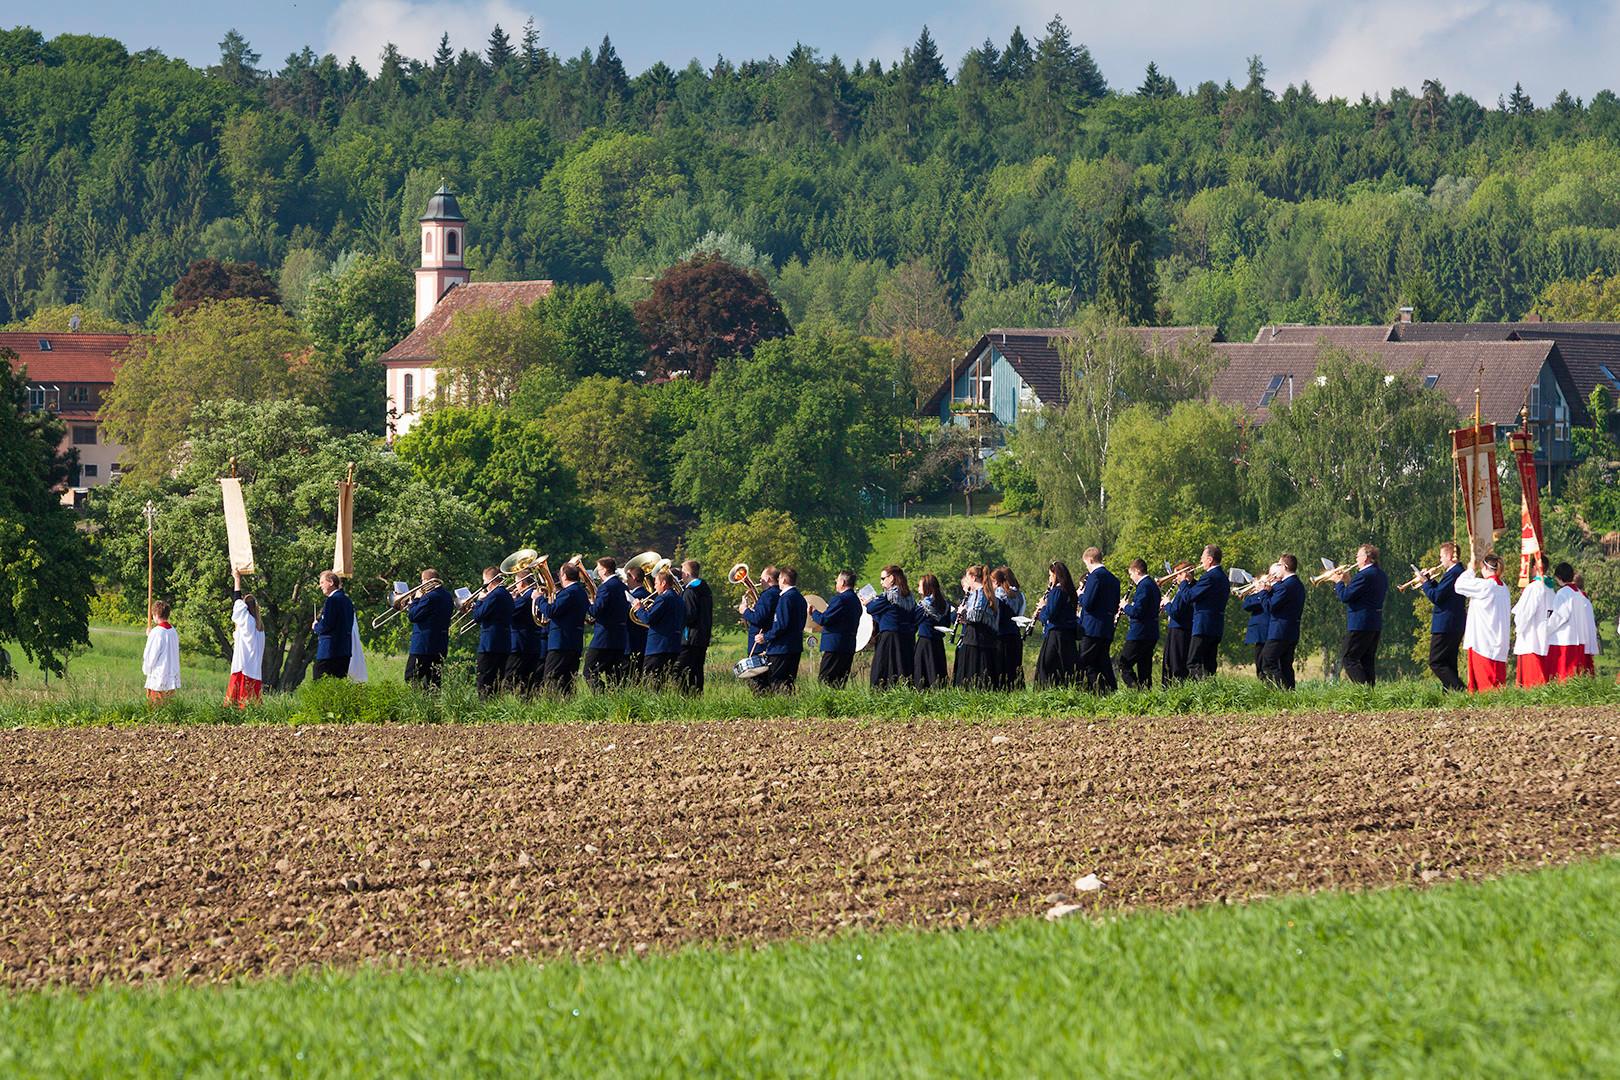 Musikverein Dingelsdorf an Christi Himmelfahrt